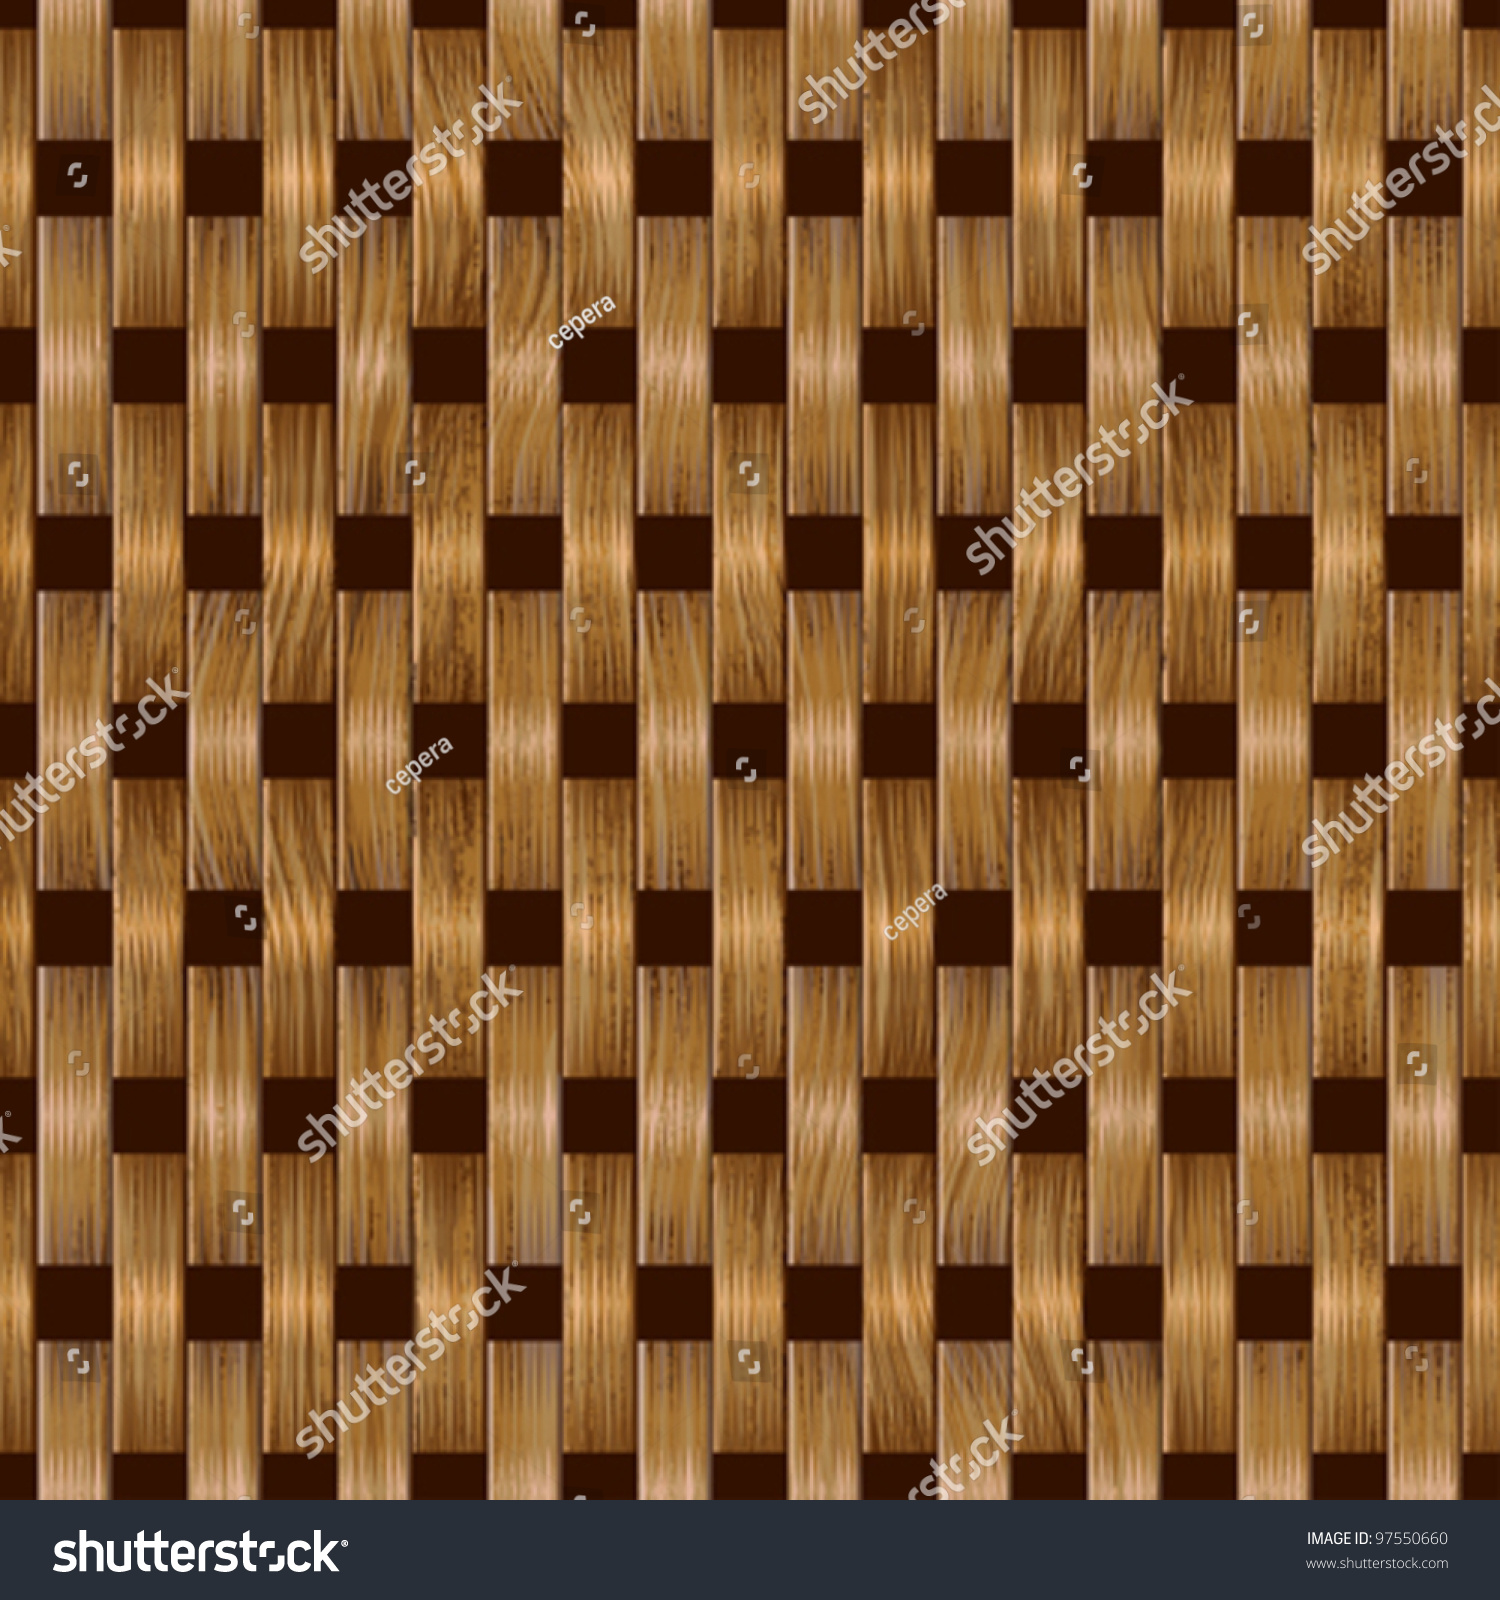 Abstract Decorative Wooden Textured Blocks Grid Stock Photo (Photo ...